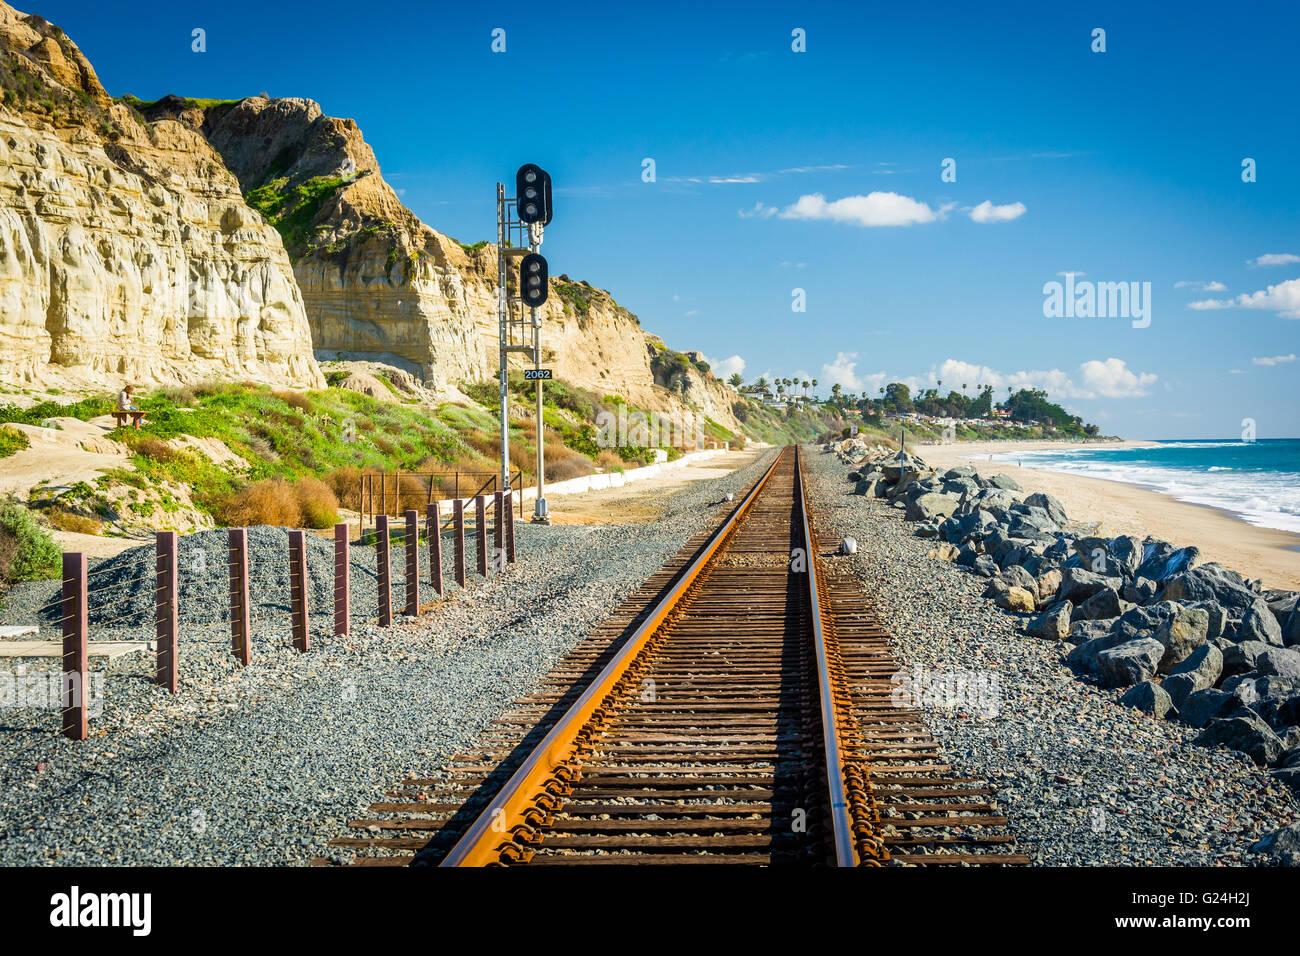 Railroad tracks along the beach in San Clemente, California. Stock Photo